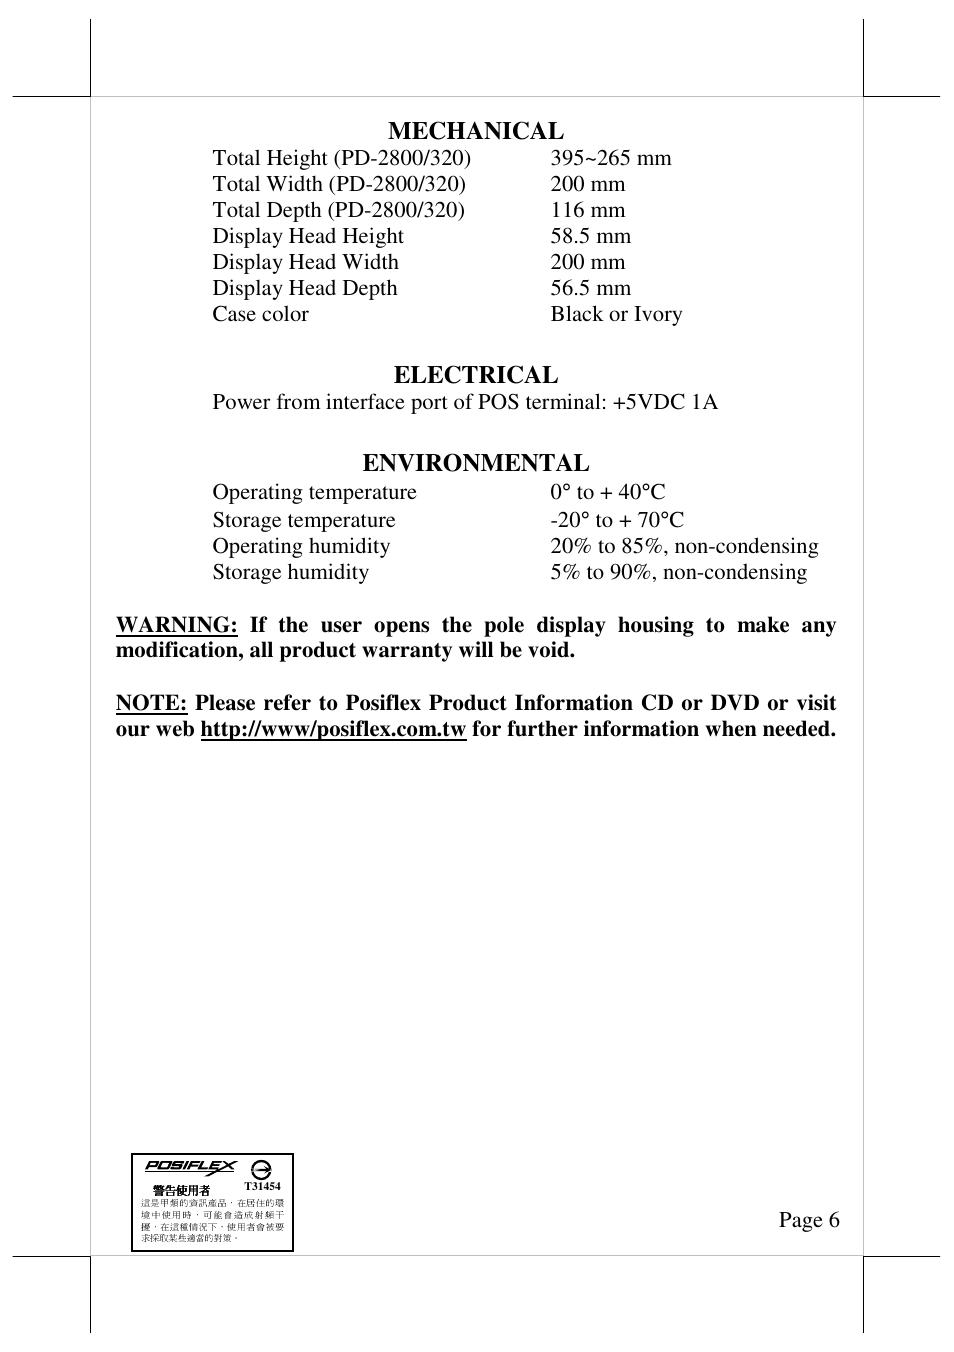 Mechanical Electrical Environmental | Posiflex PD-2800UE User Manual | Page 7 /  sc 1 st  manualsdir.com & Mechanical Electrical Environmental | Posiflex PD-2800UE User ...